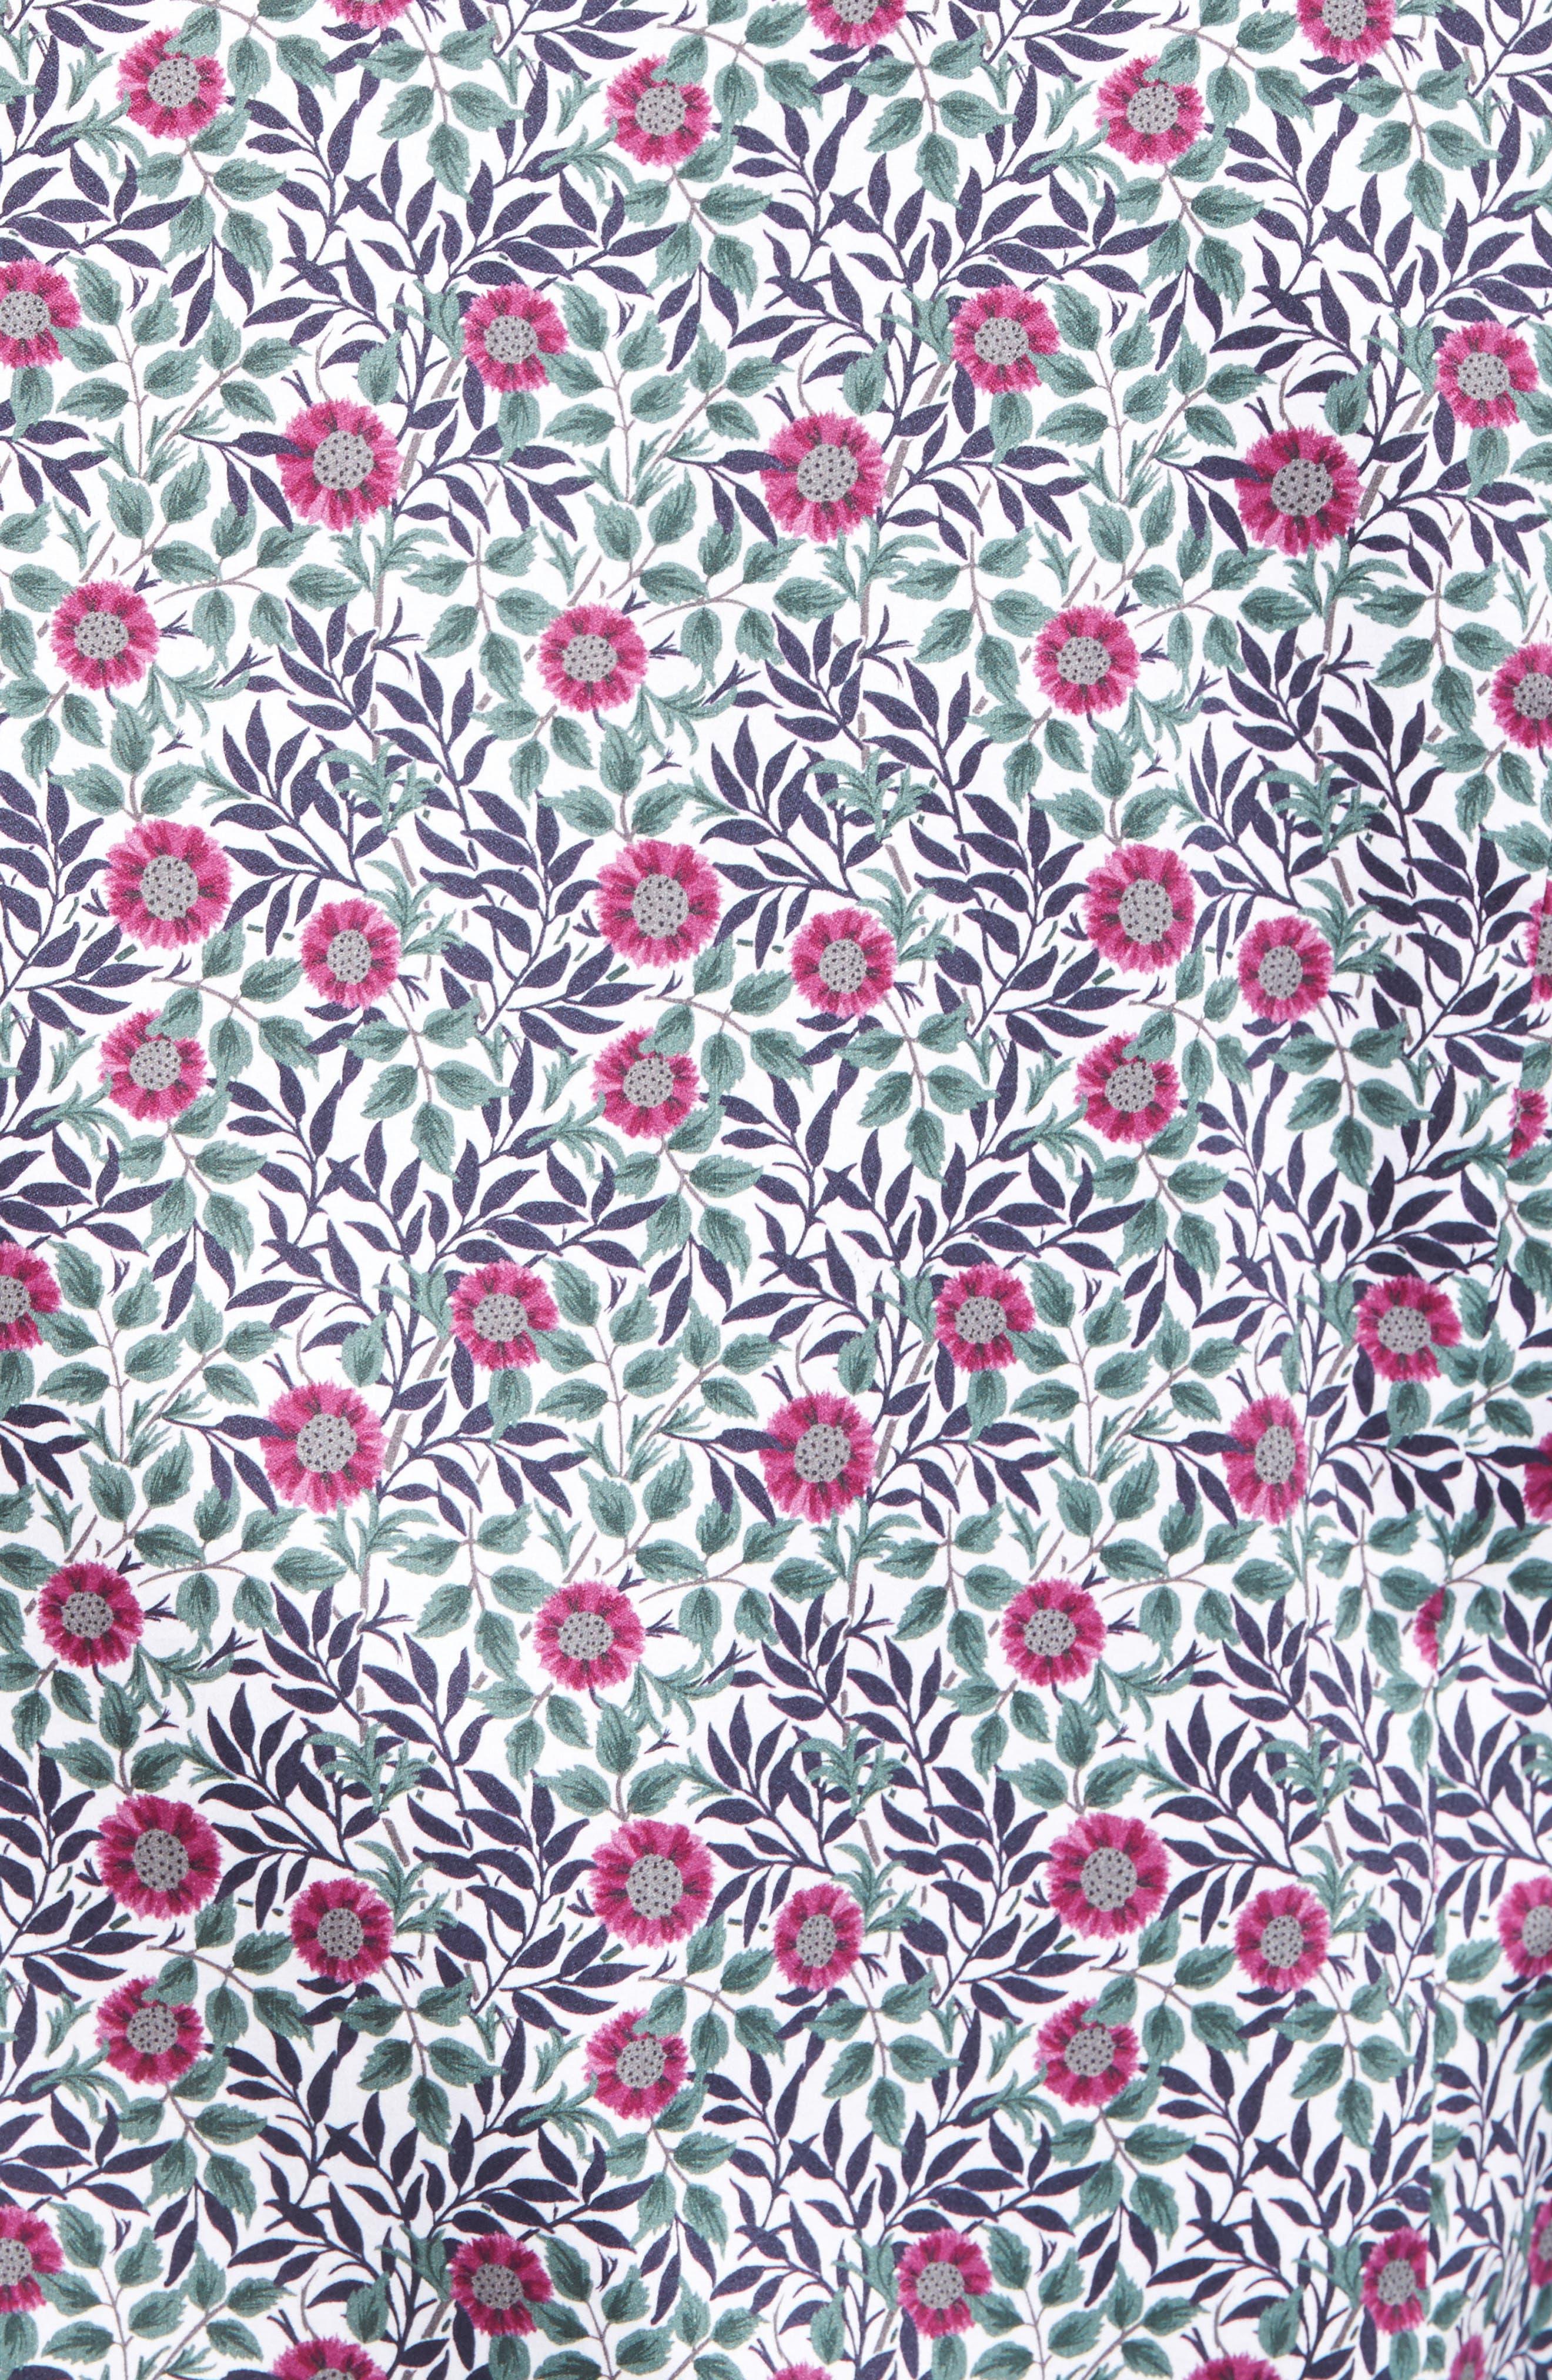 Orense Floral Print Slim Fit Shirt,                             Alternate thumbnail 5, color,                             Green